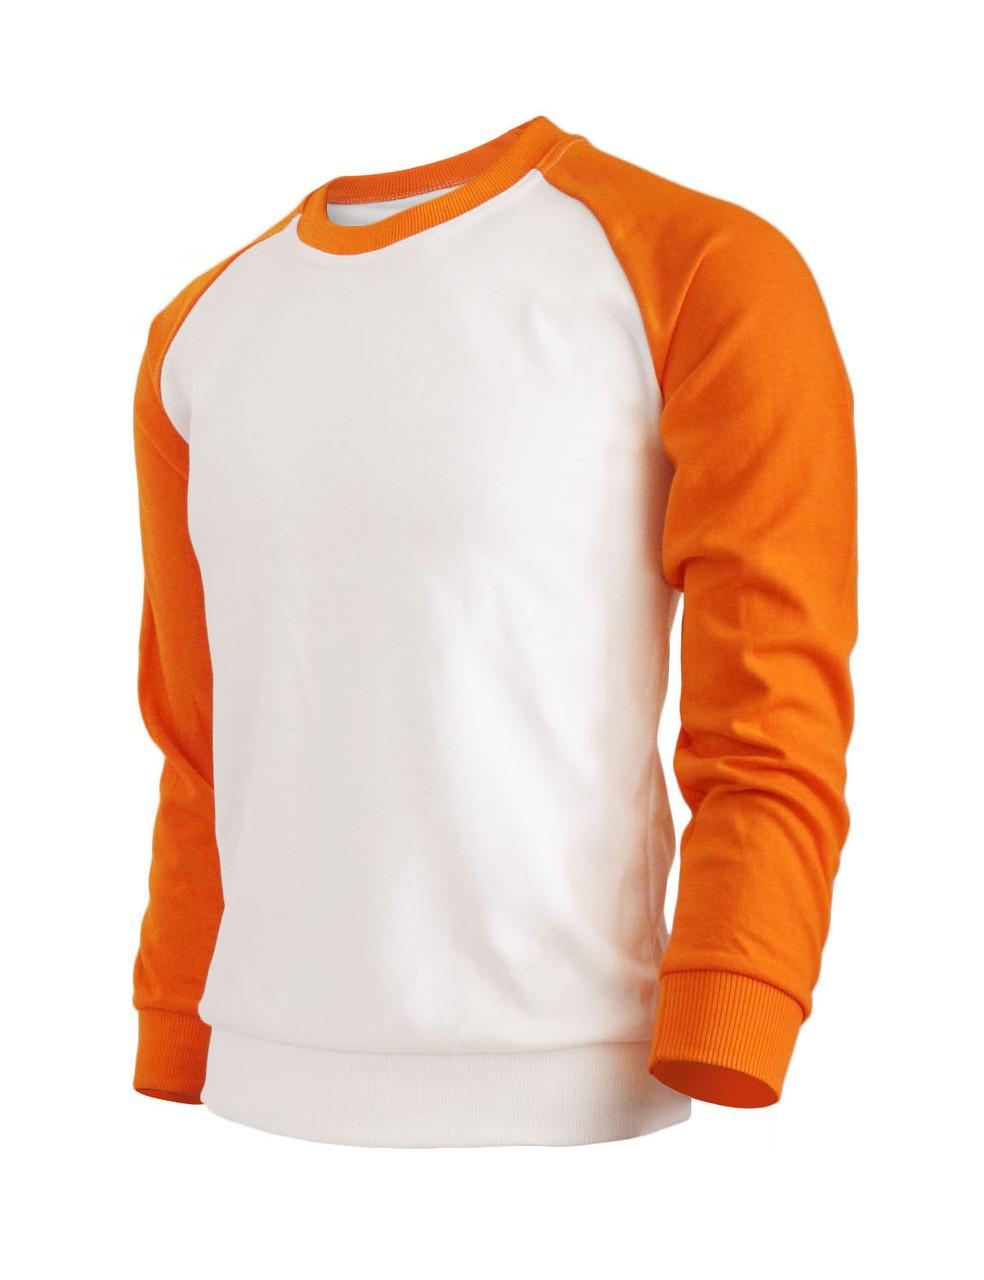 72244f607 BCPOLO Men's Casual raglan 2 tone color t-shirt sportswear fashion crew neck  cotton shirt.